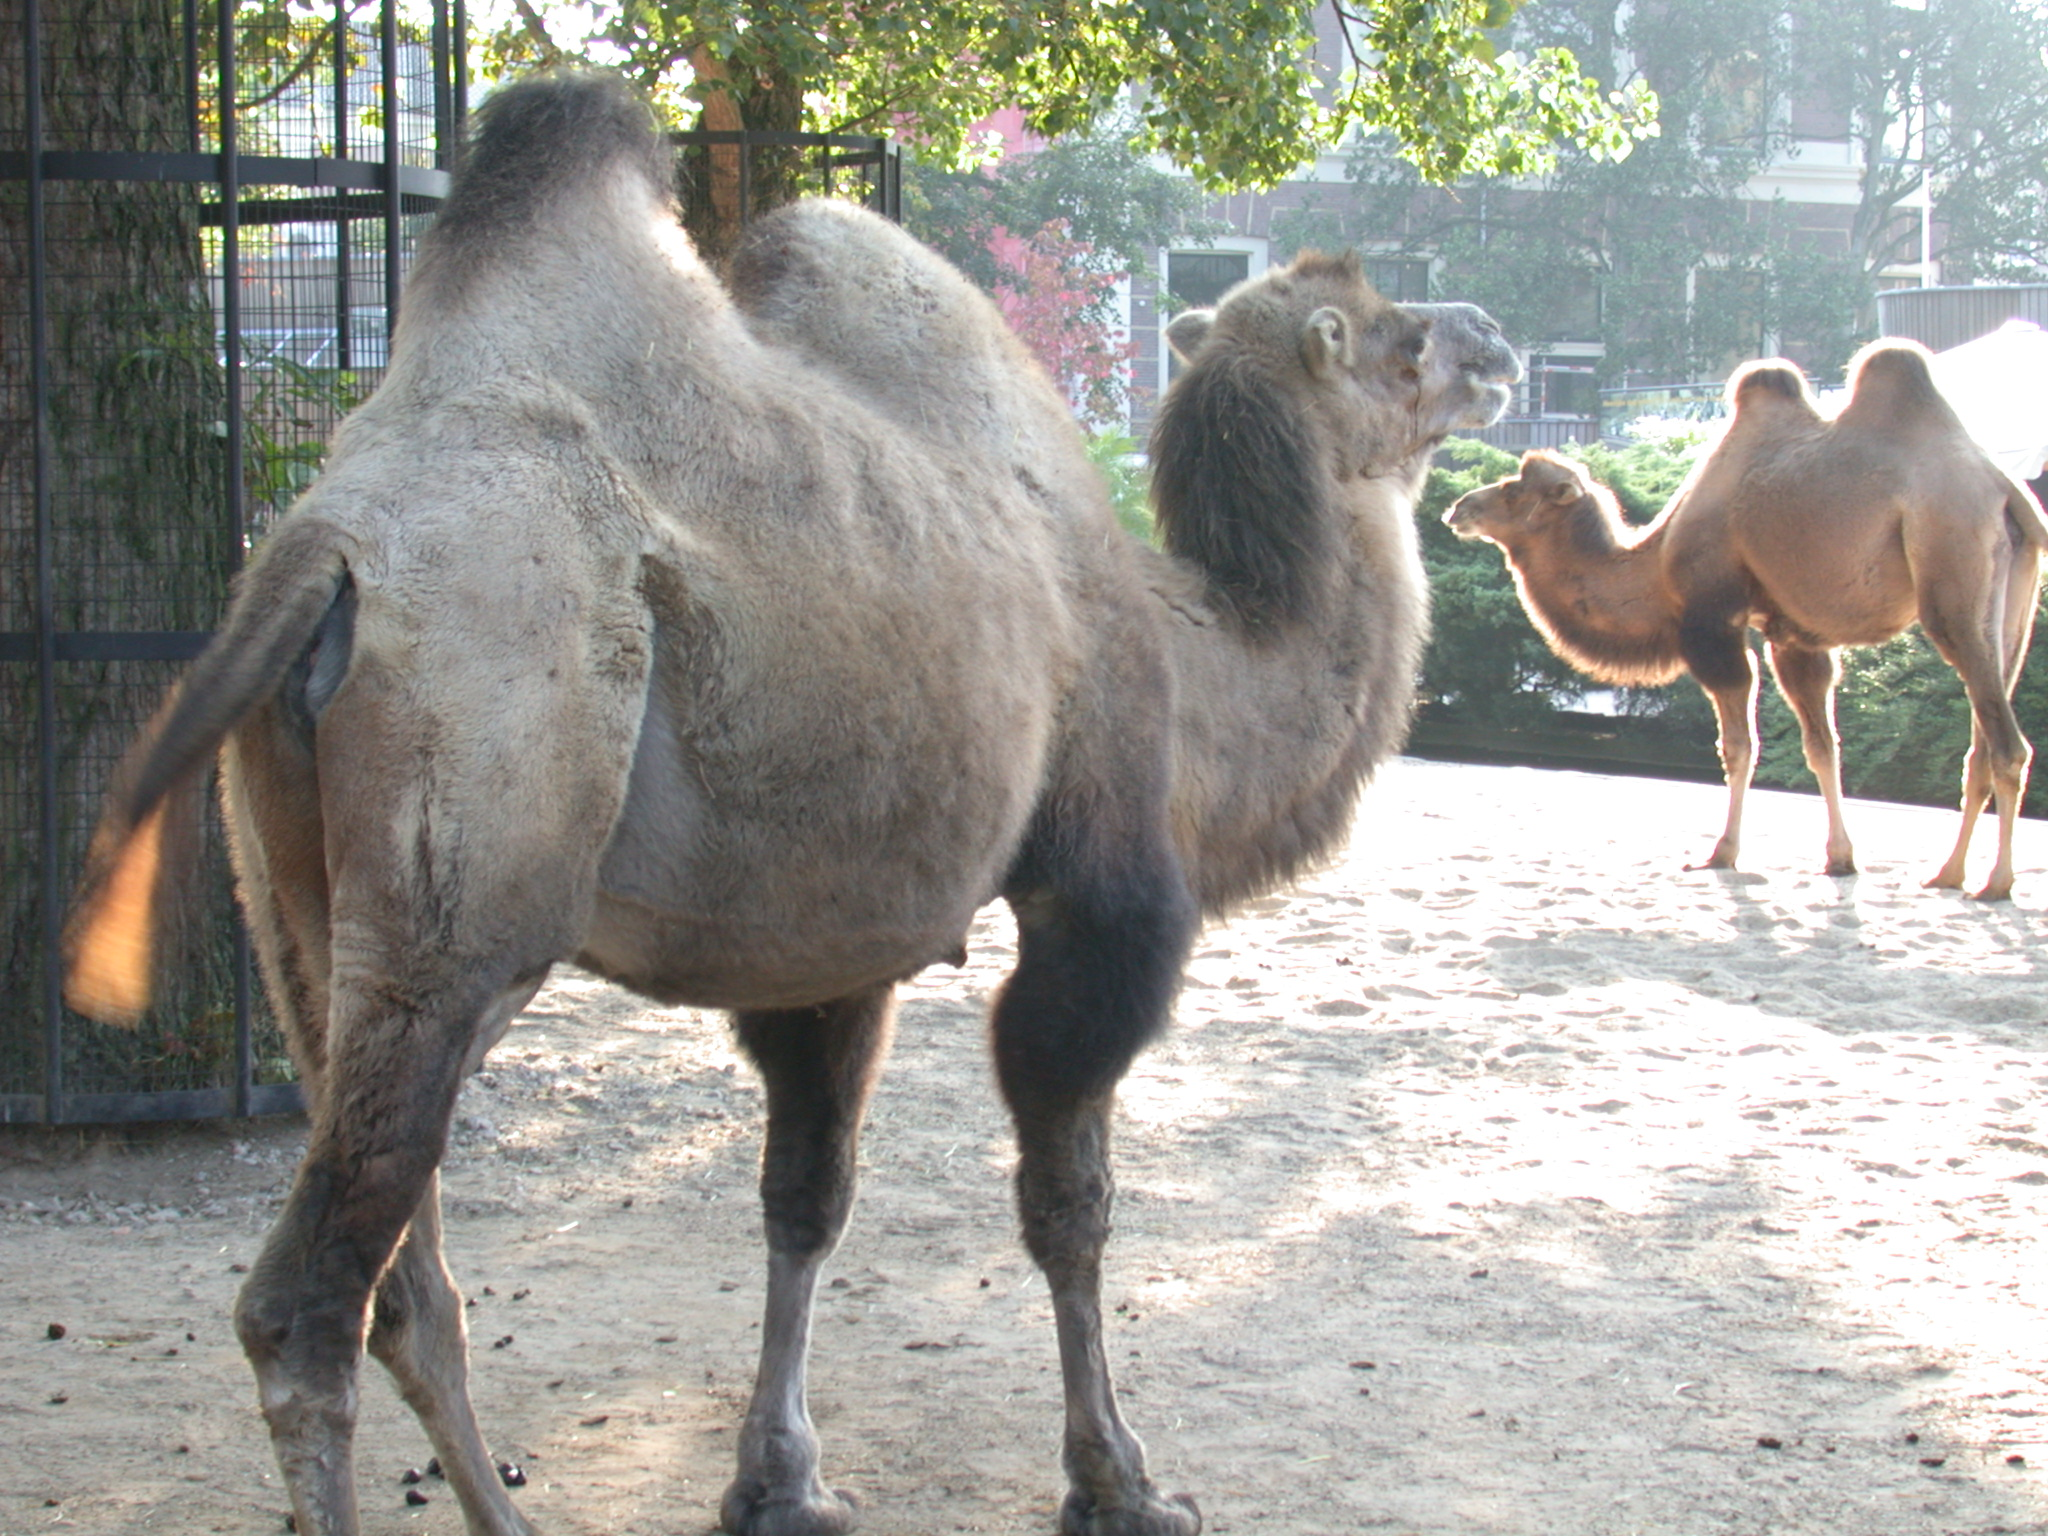 camel drommedary ship of the deset grey fur zoo animals